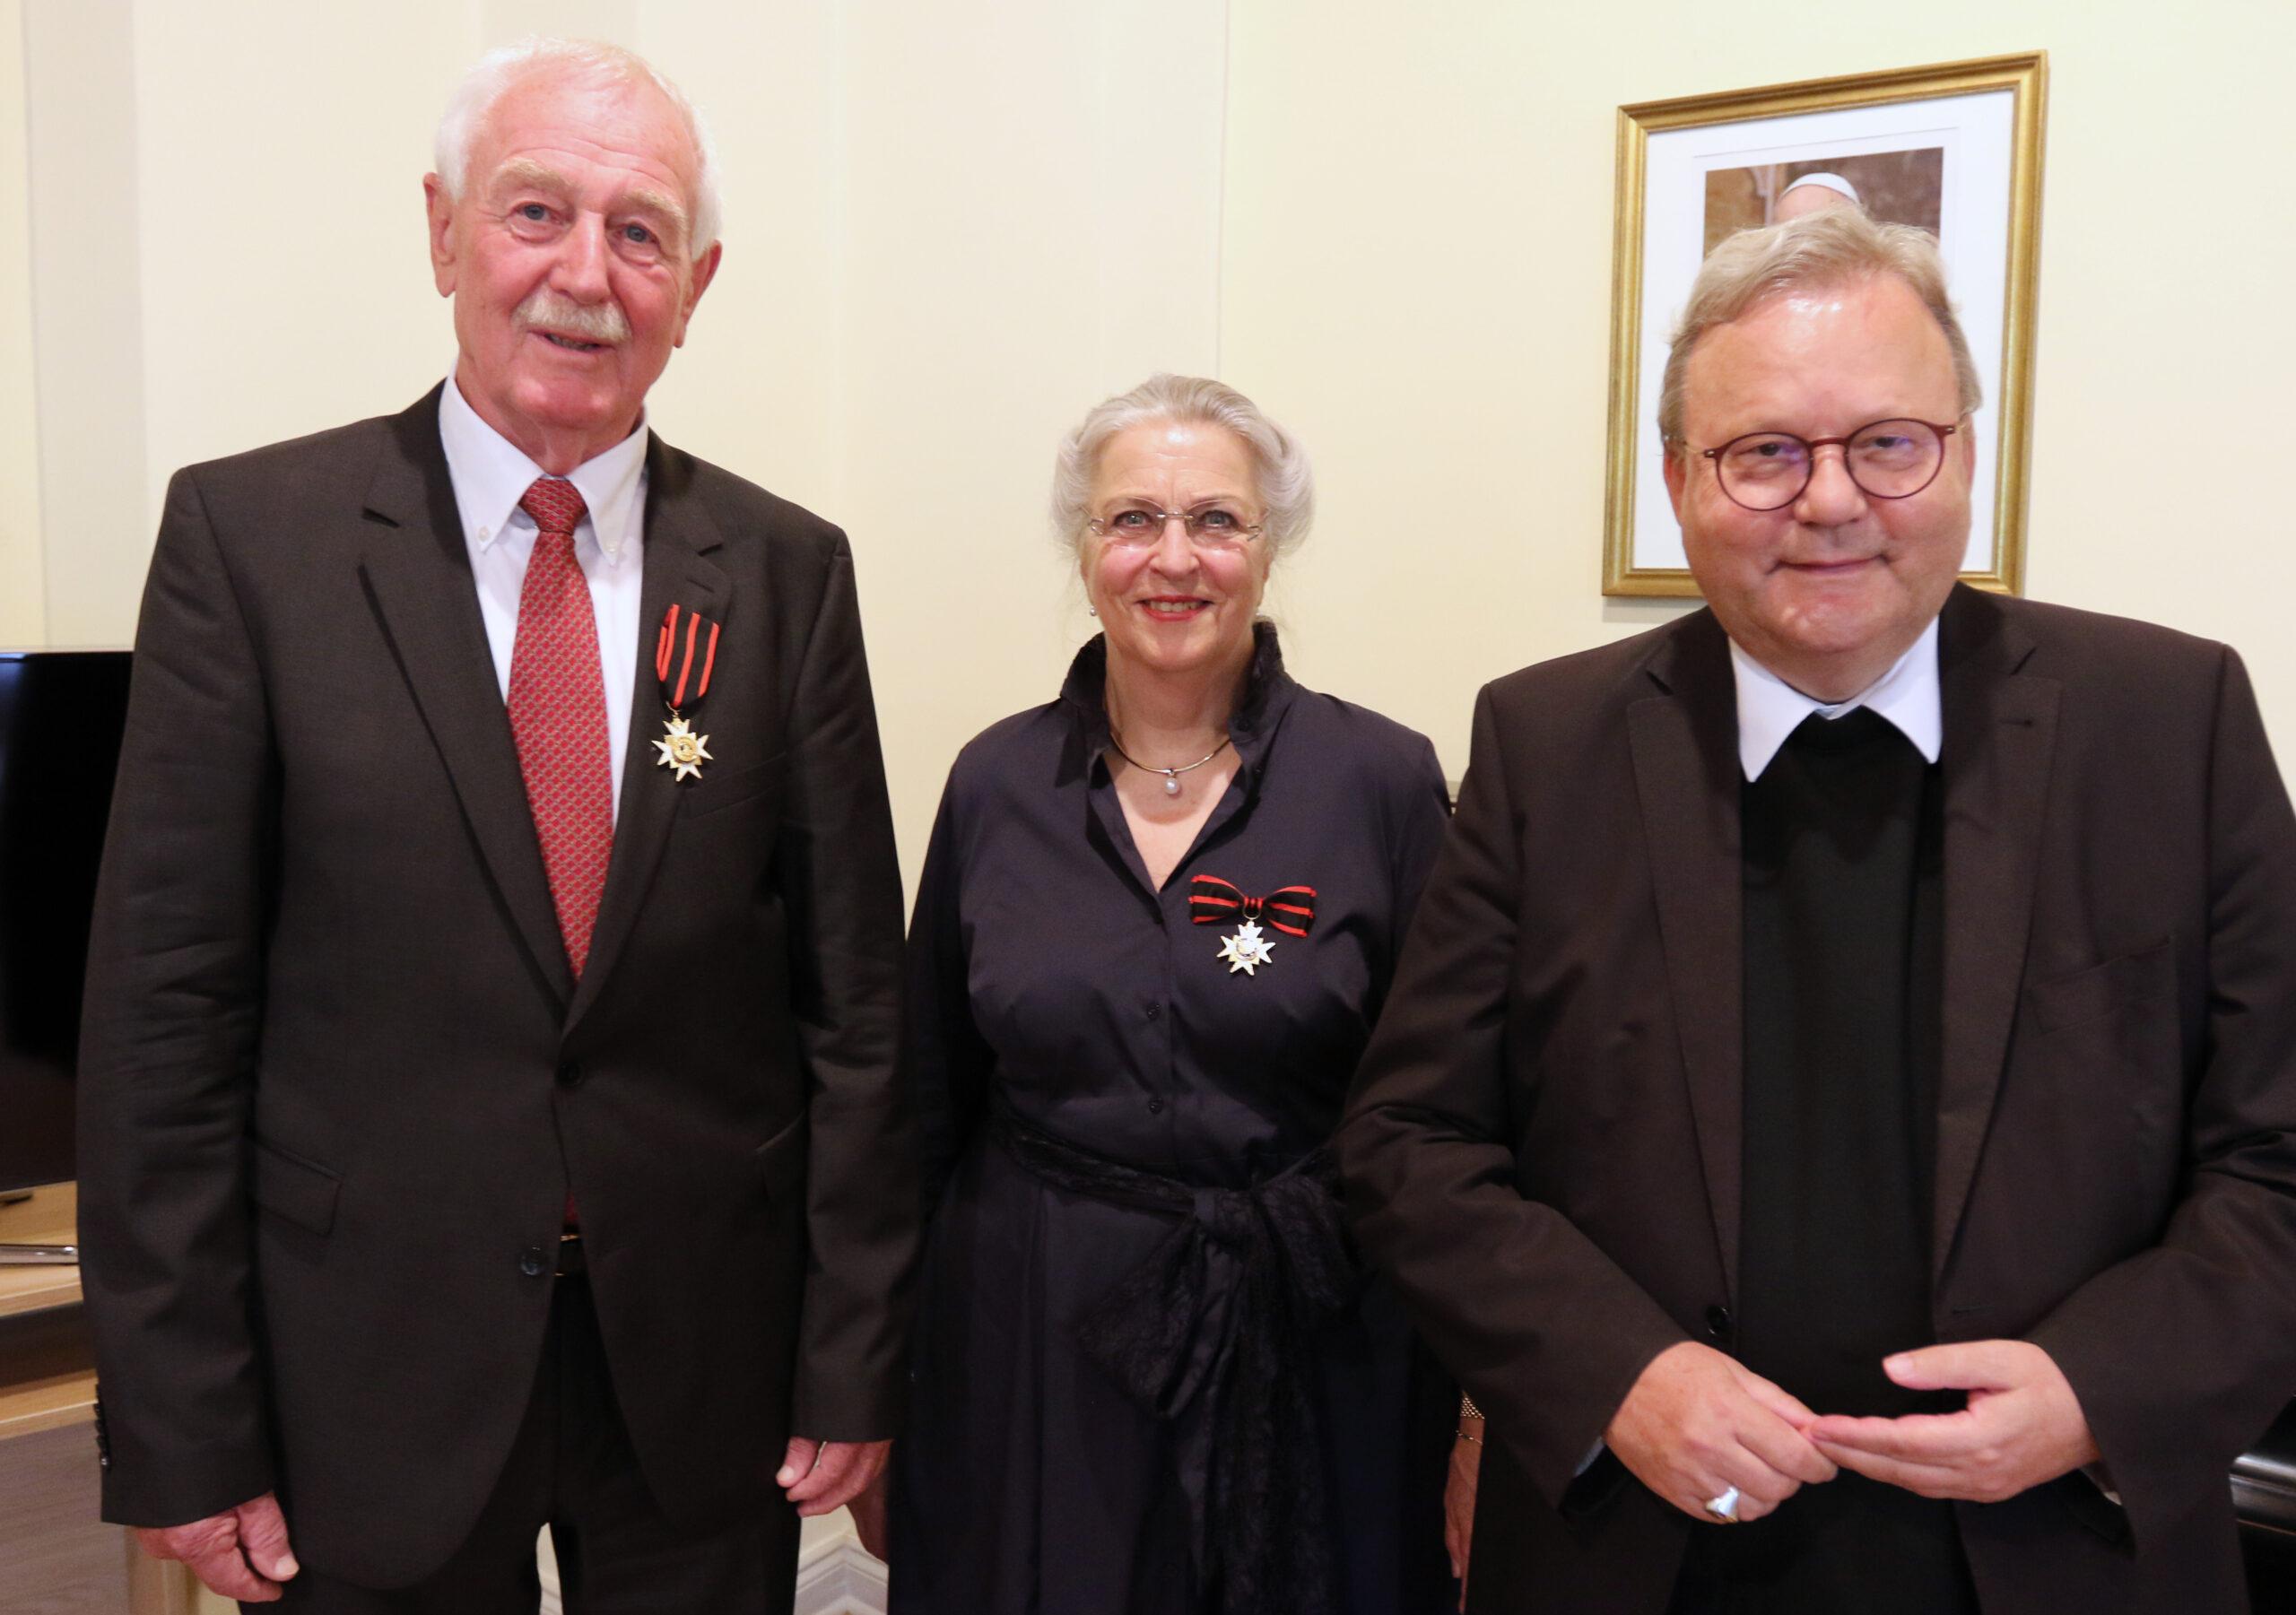 Doris Schomaker erhält den Silvesterorden